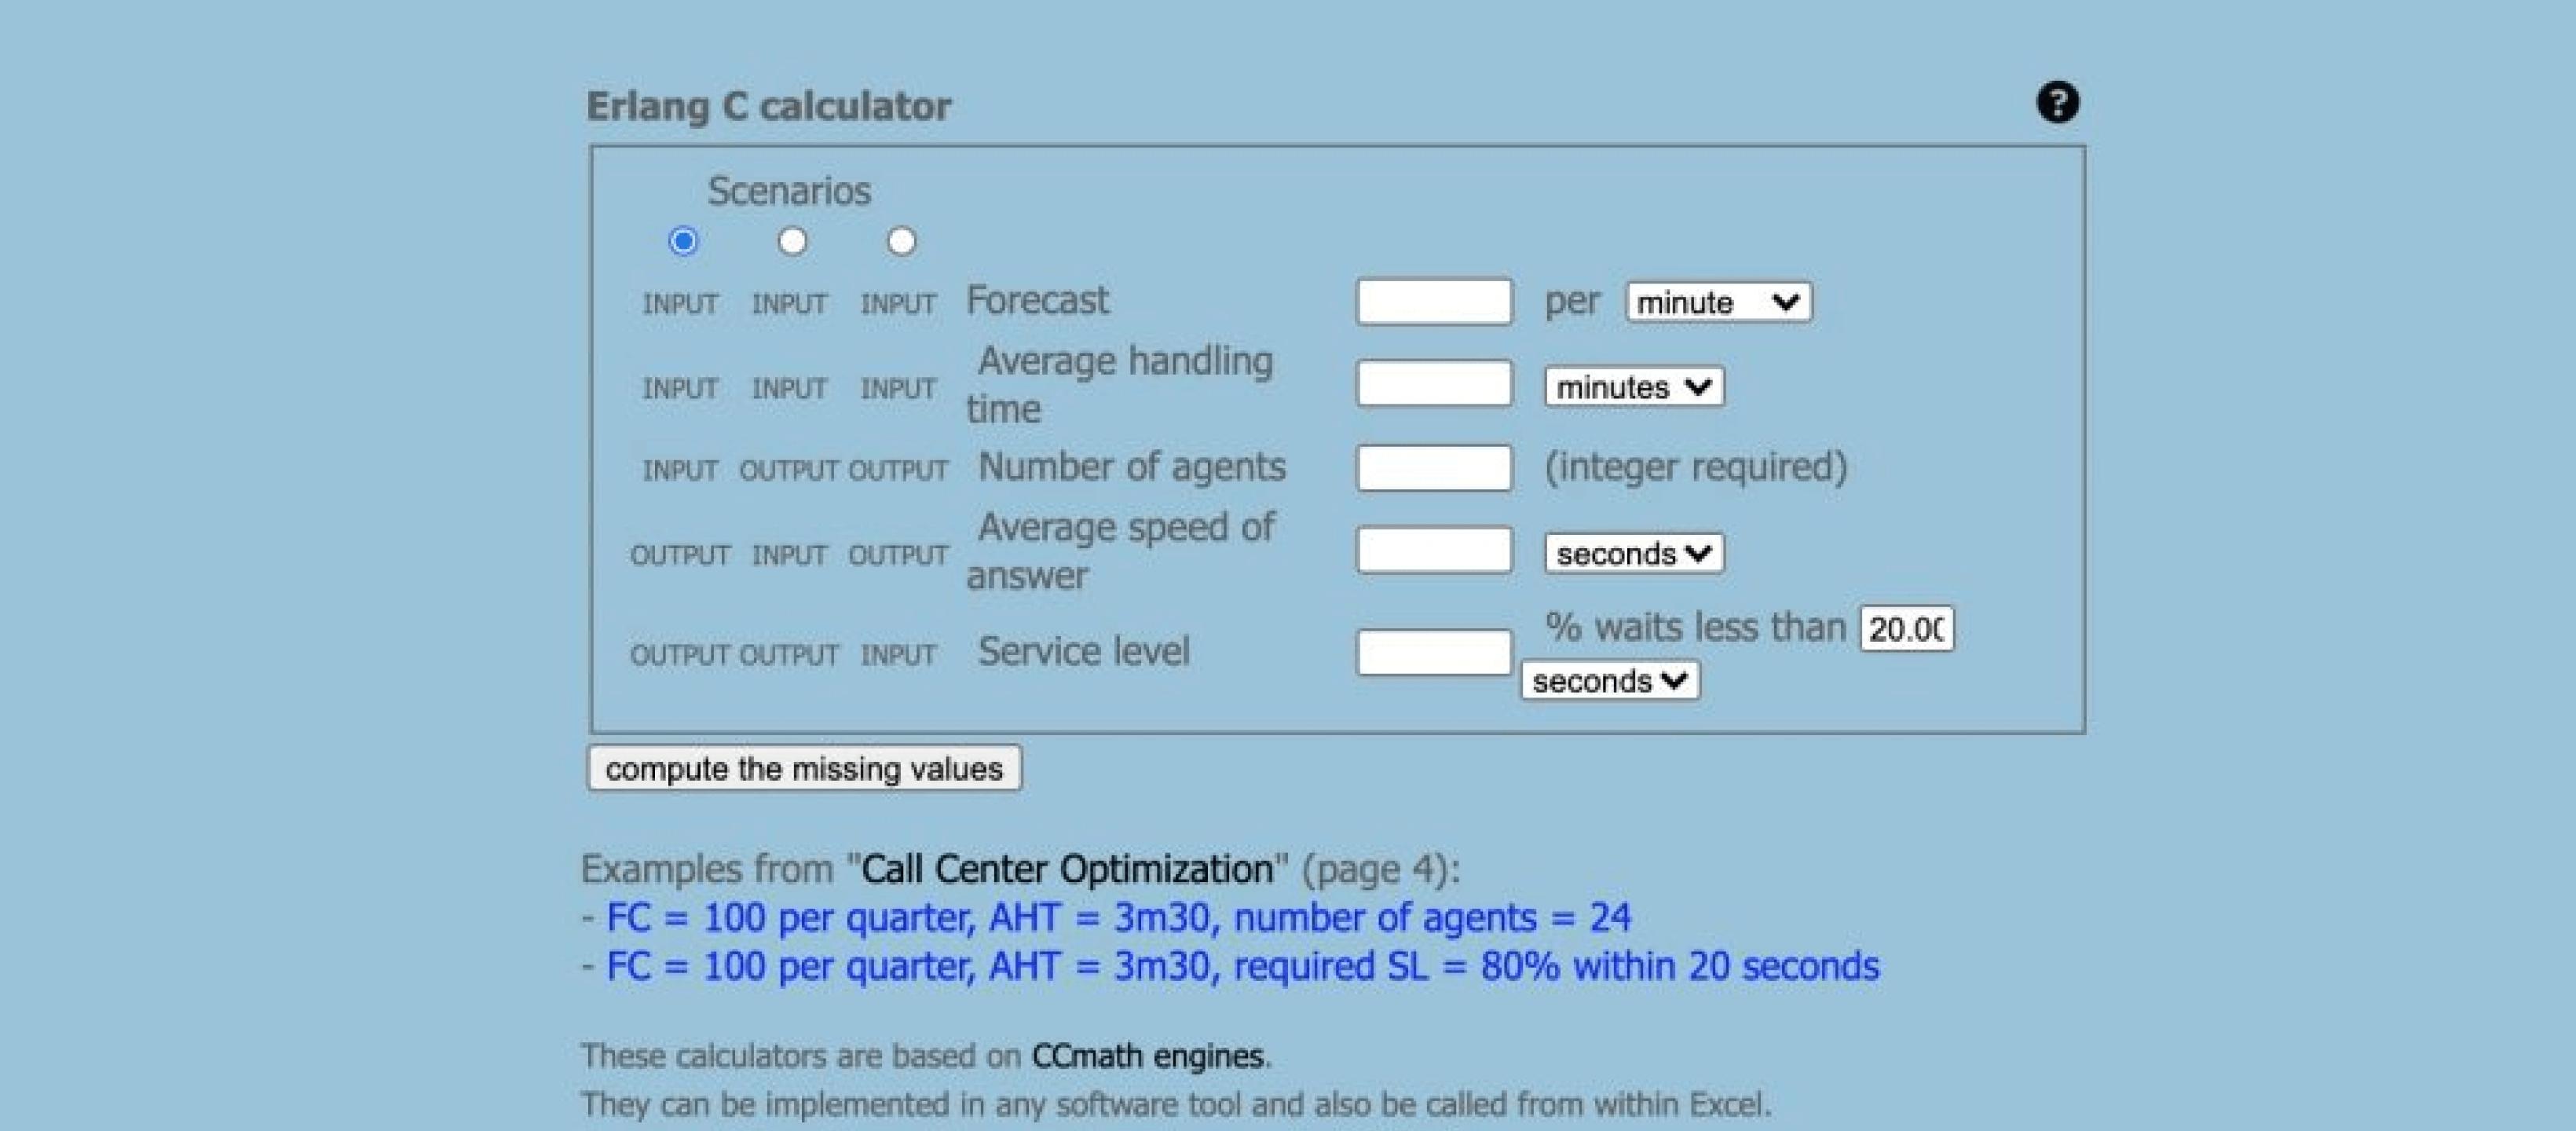 Erlang Calculator screenshot